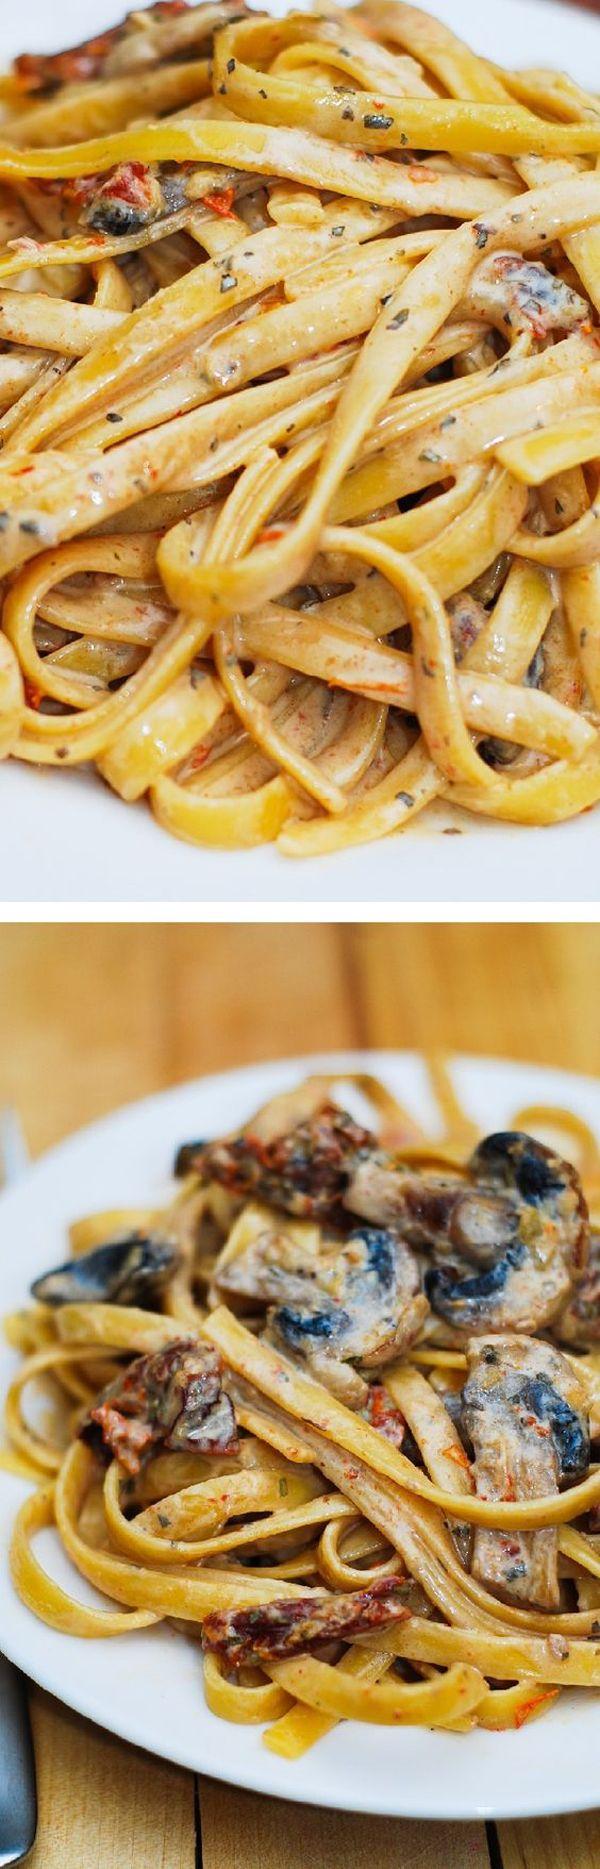 mushroom pasta in a garlic and basil sauce